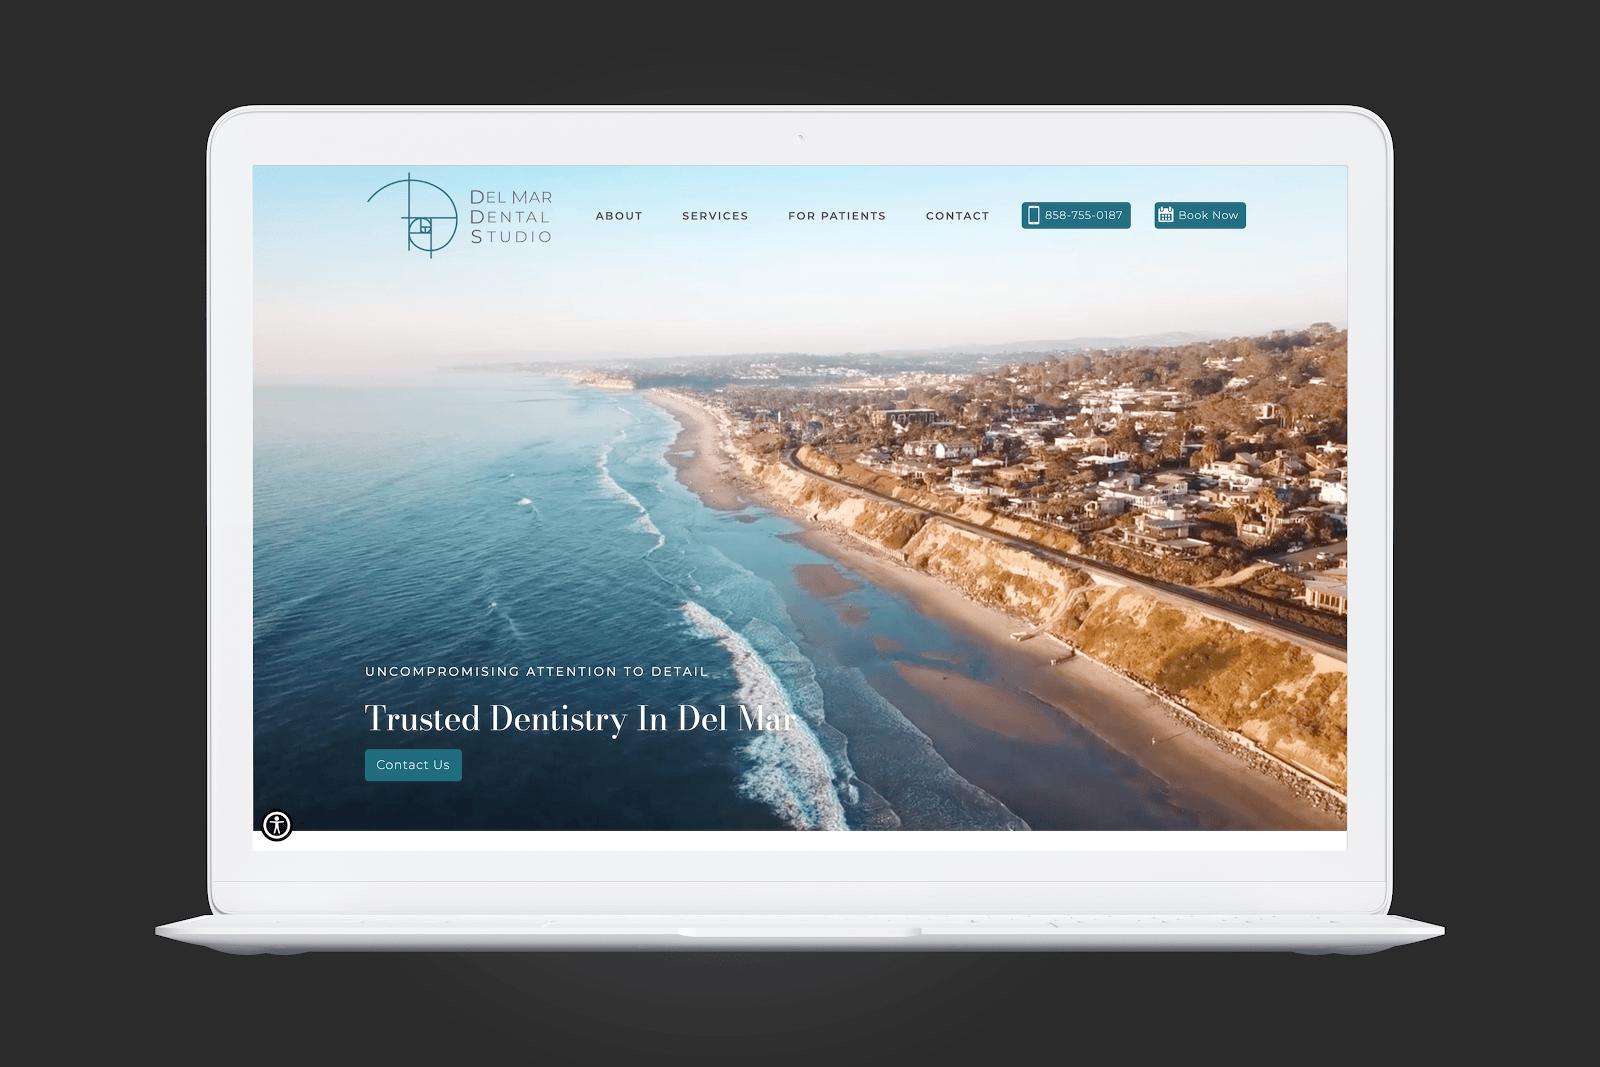 Del Mar Dental Studio homepage screengrab